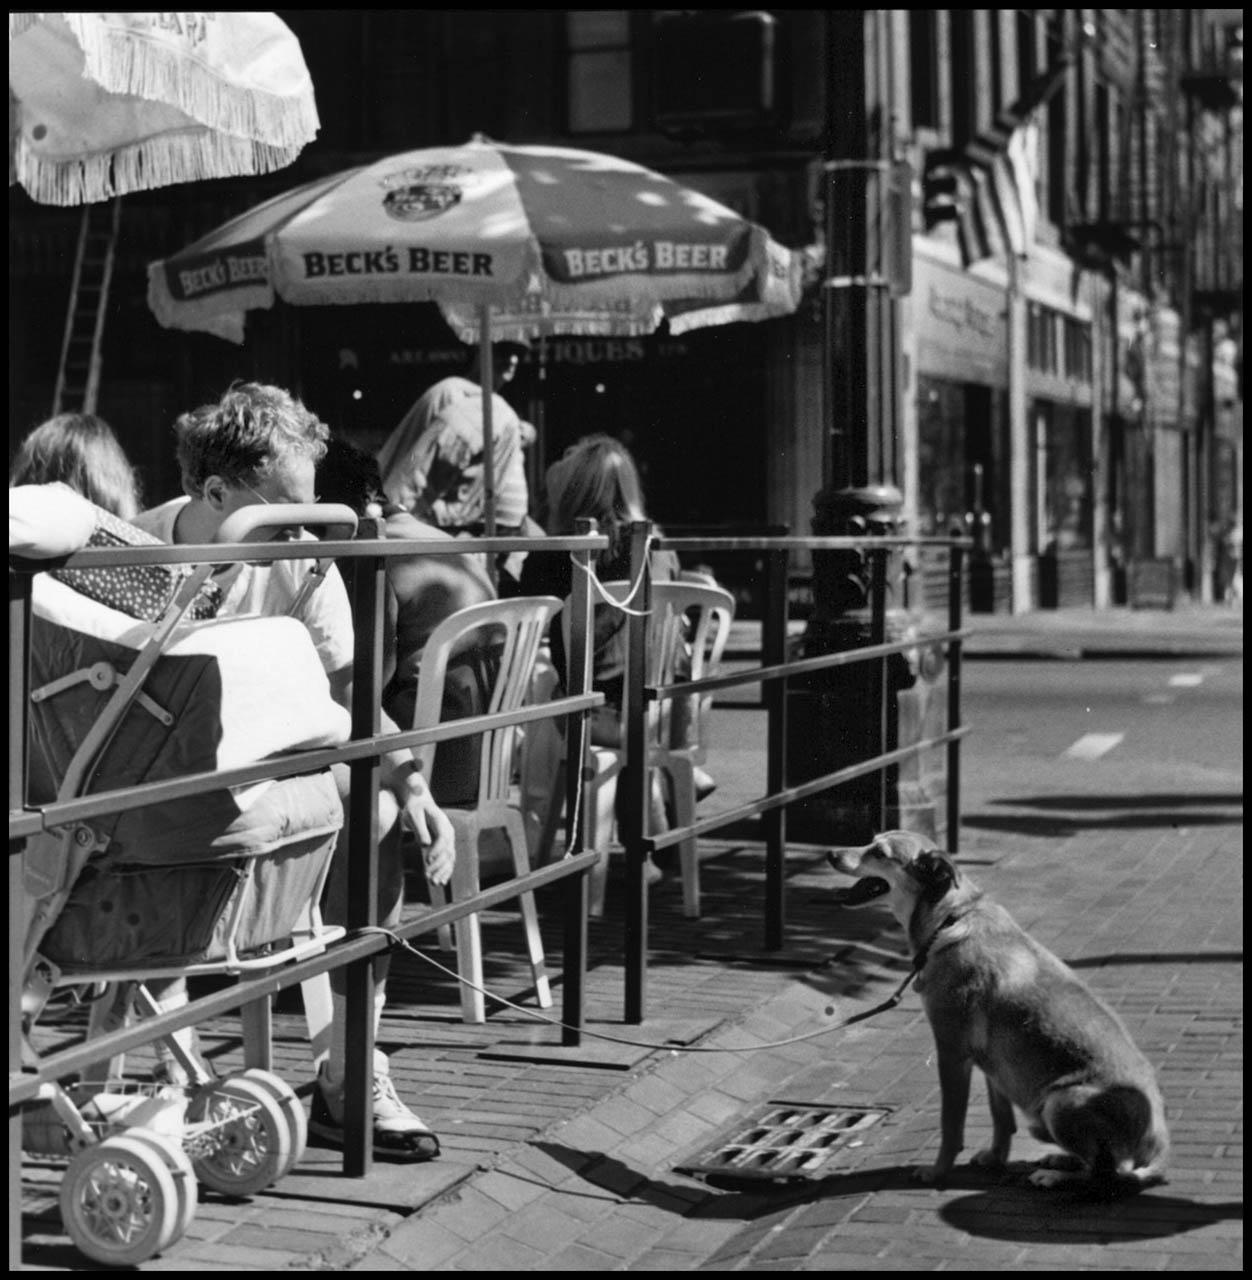 Occidental Square #25, 1991